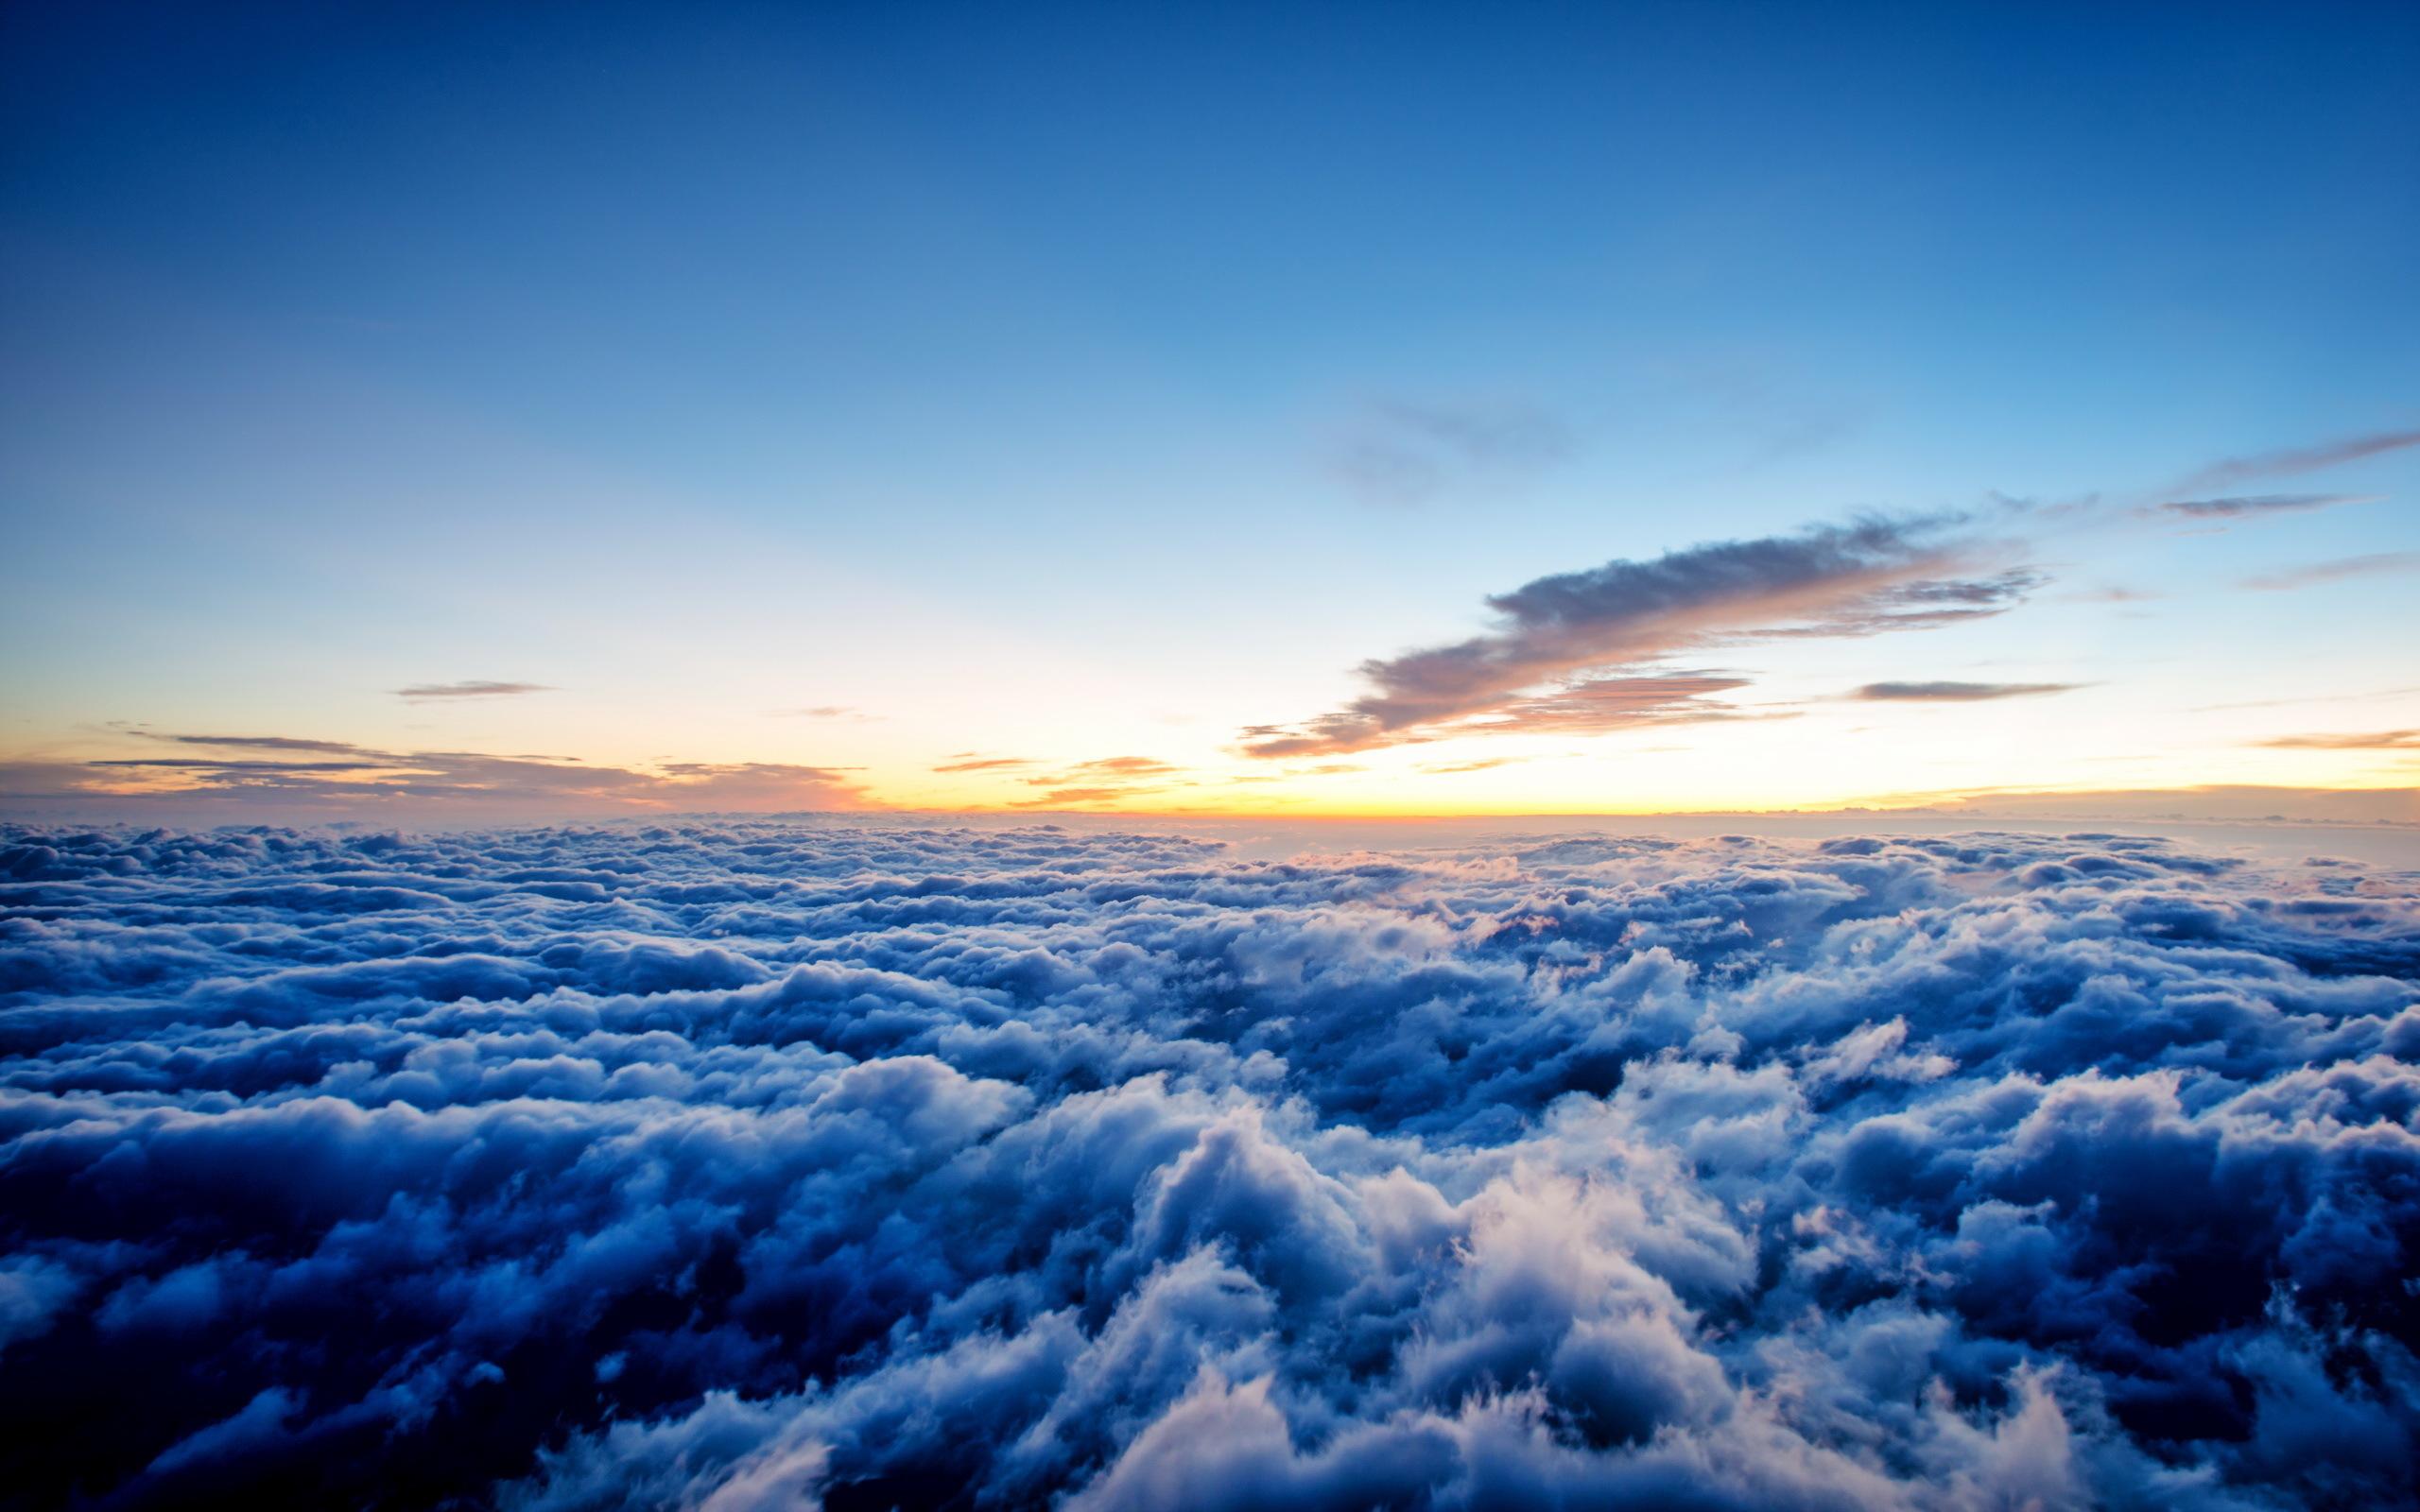 небо облака фото высокого разрешения